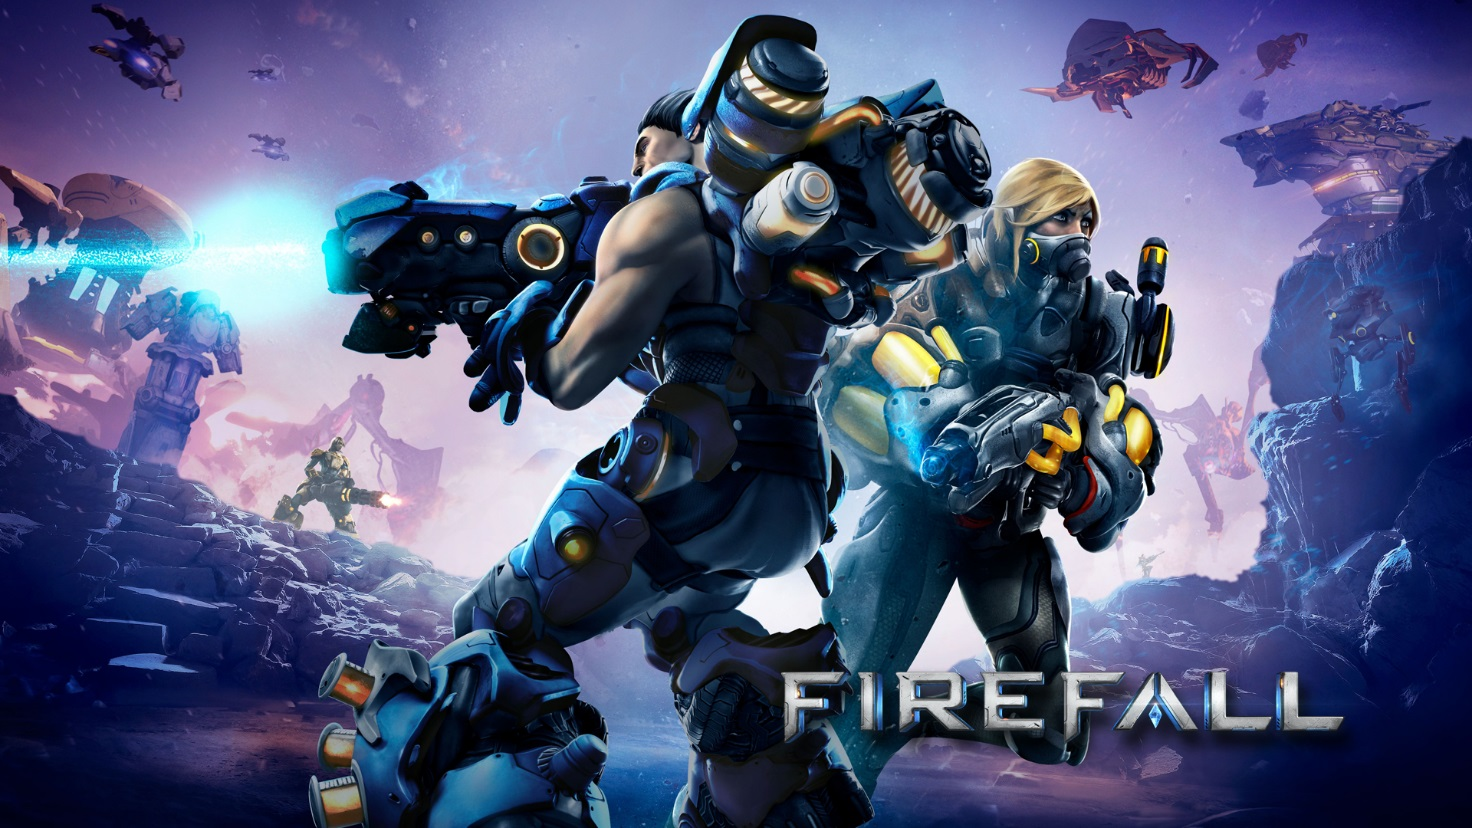 Картинки по запросу Firefall